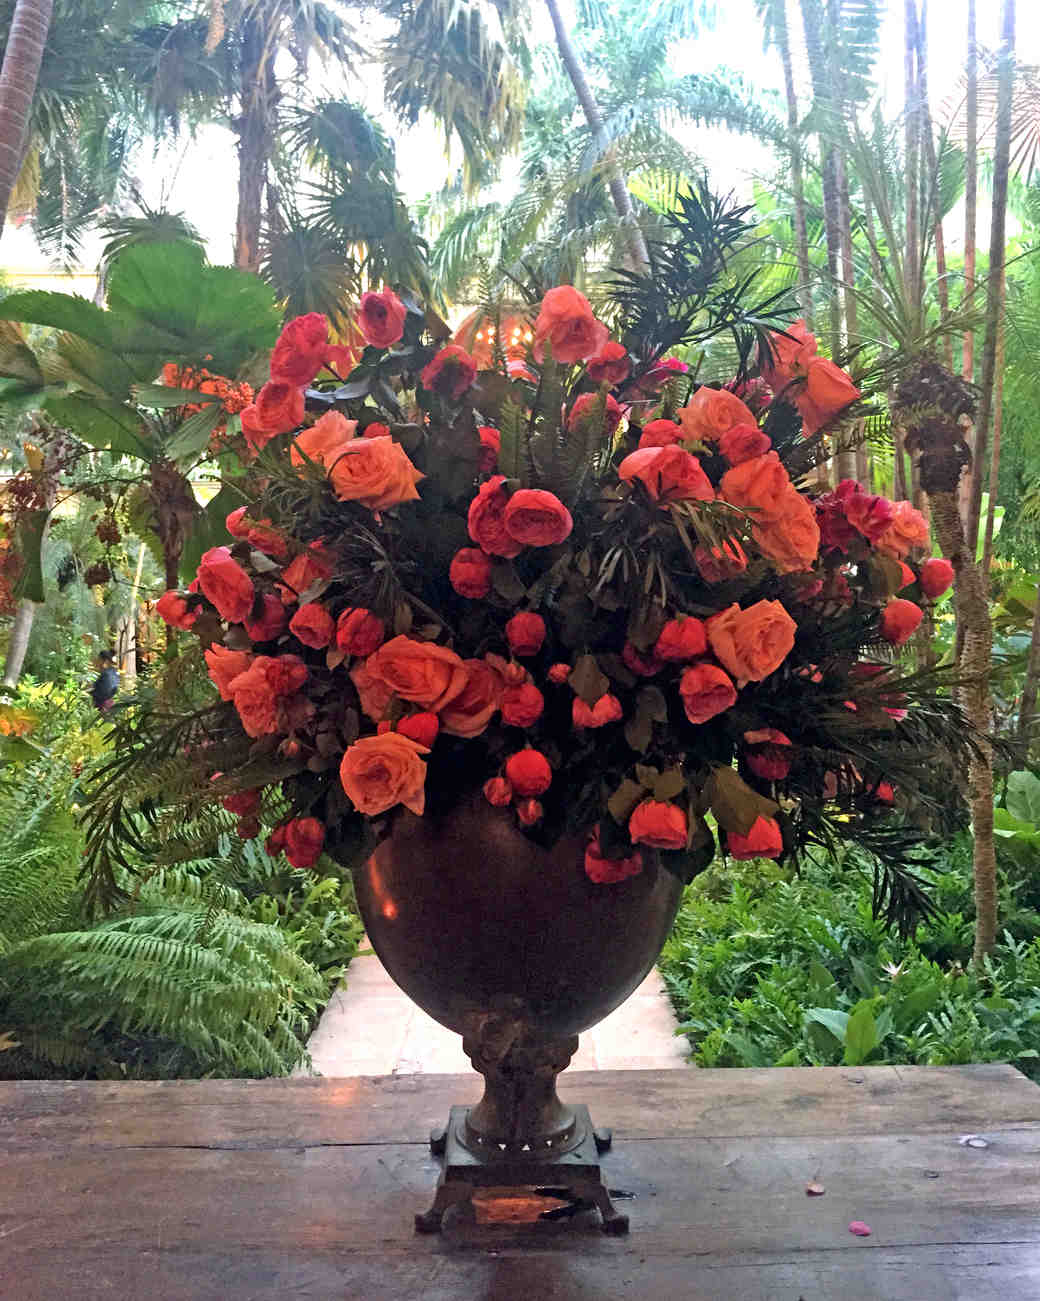 cartagena-bridal-week-matthew-robbins-7884-0915.jpg